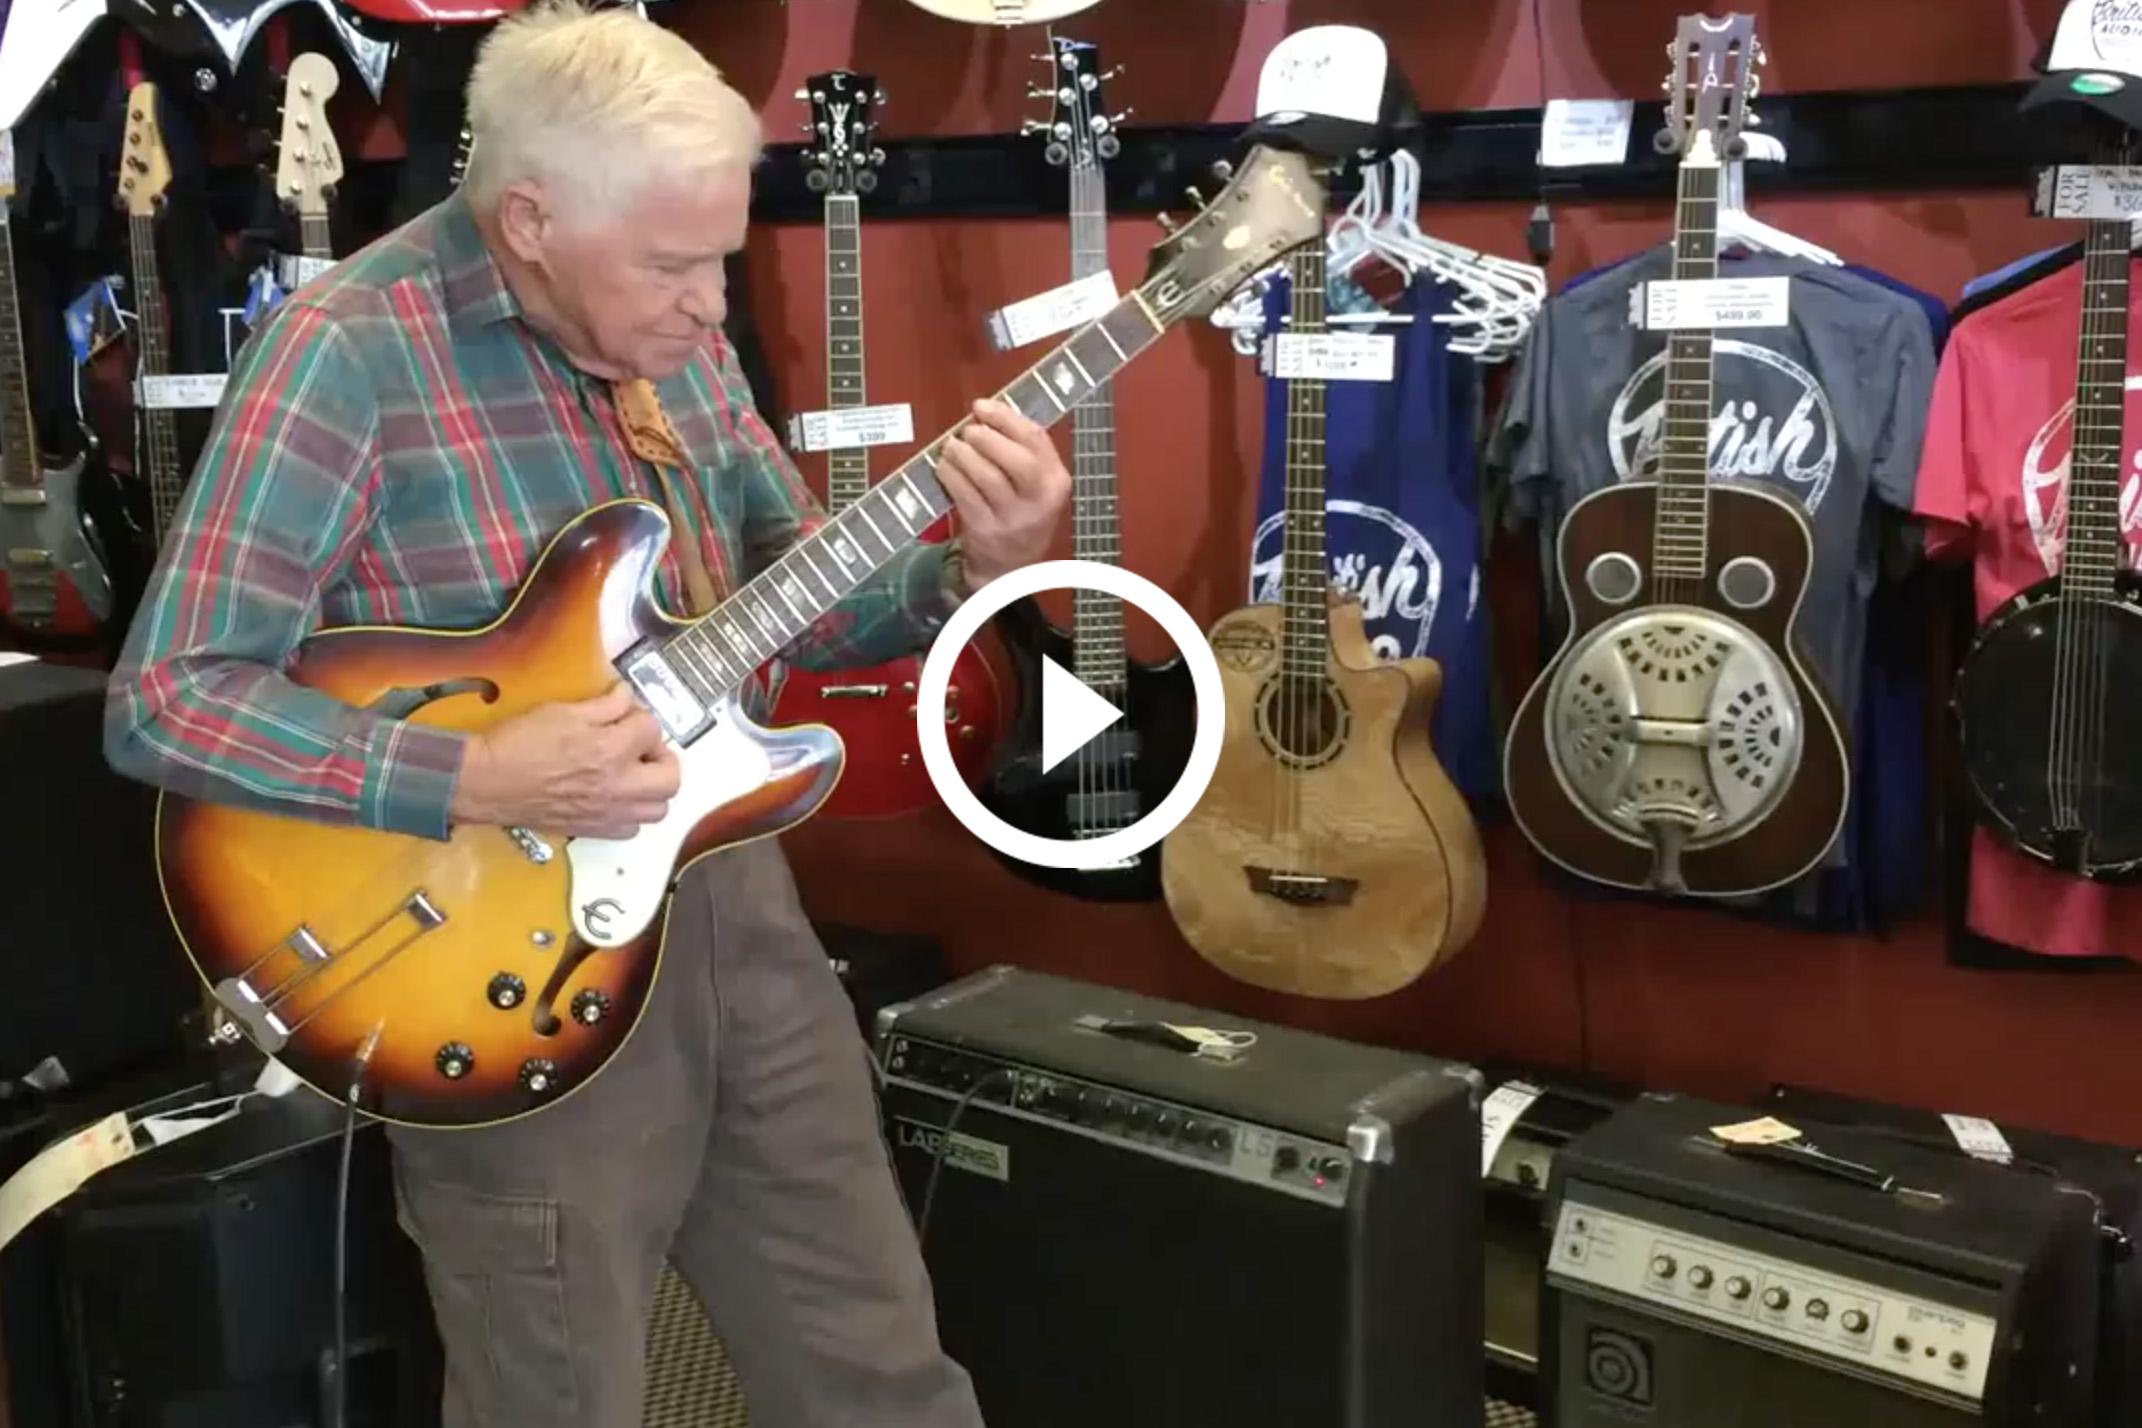 Anciano tocando la guitarra